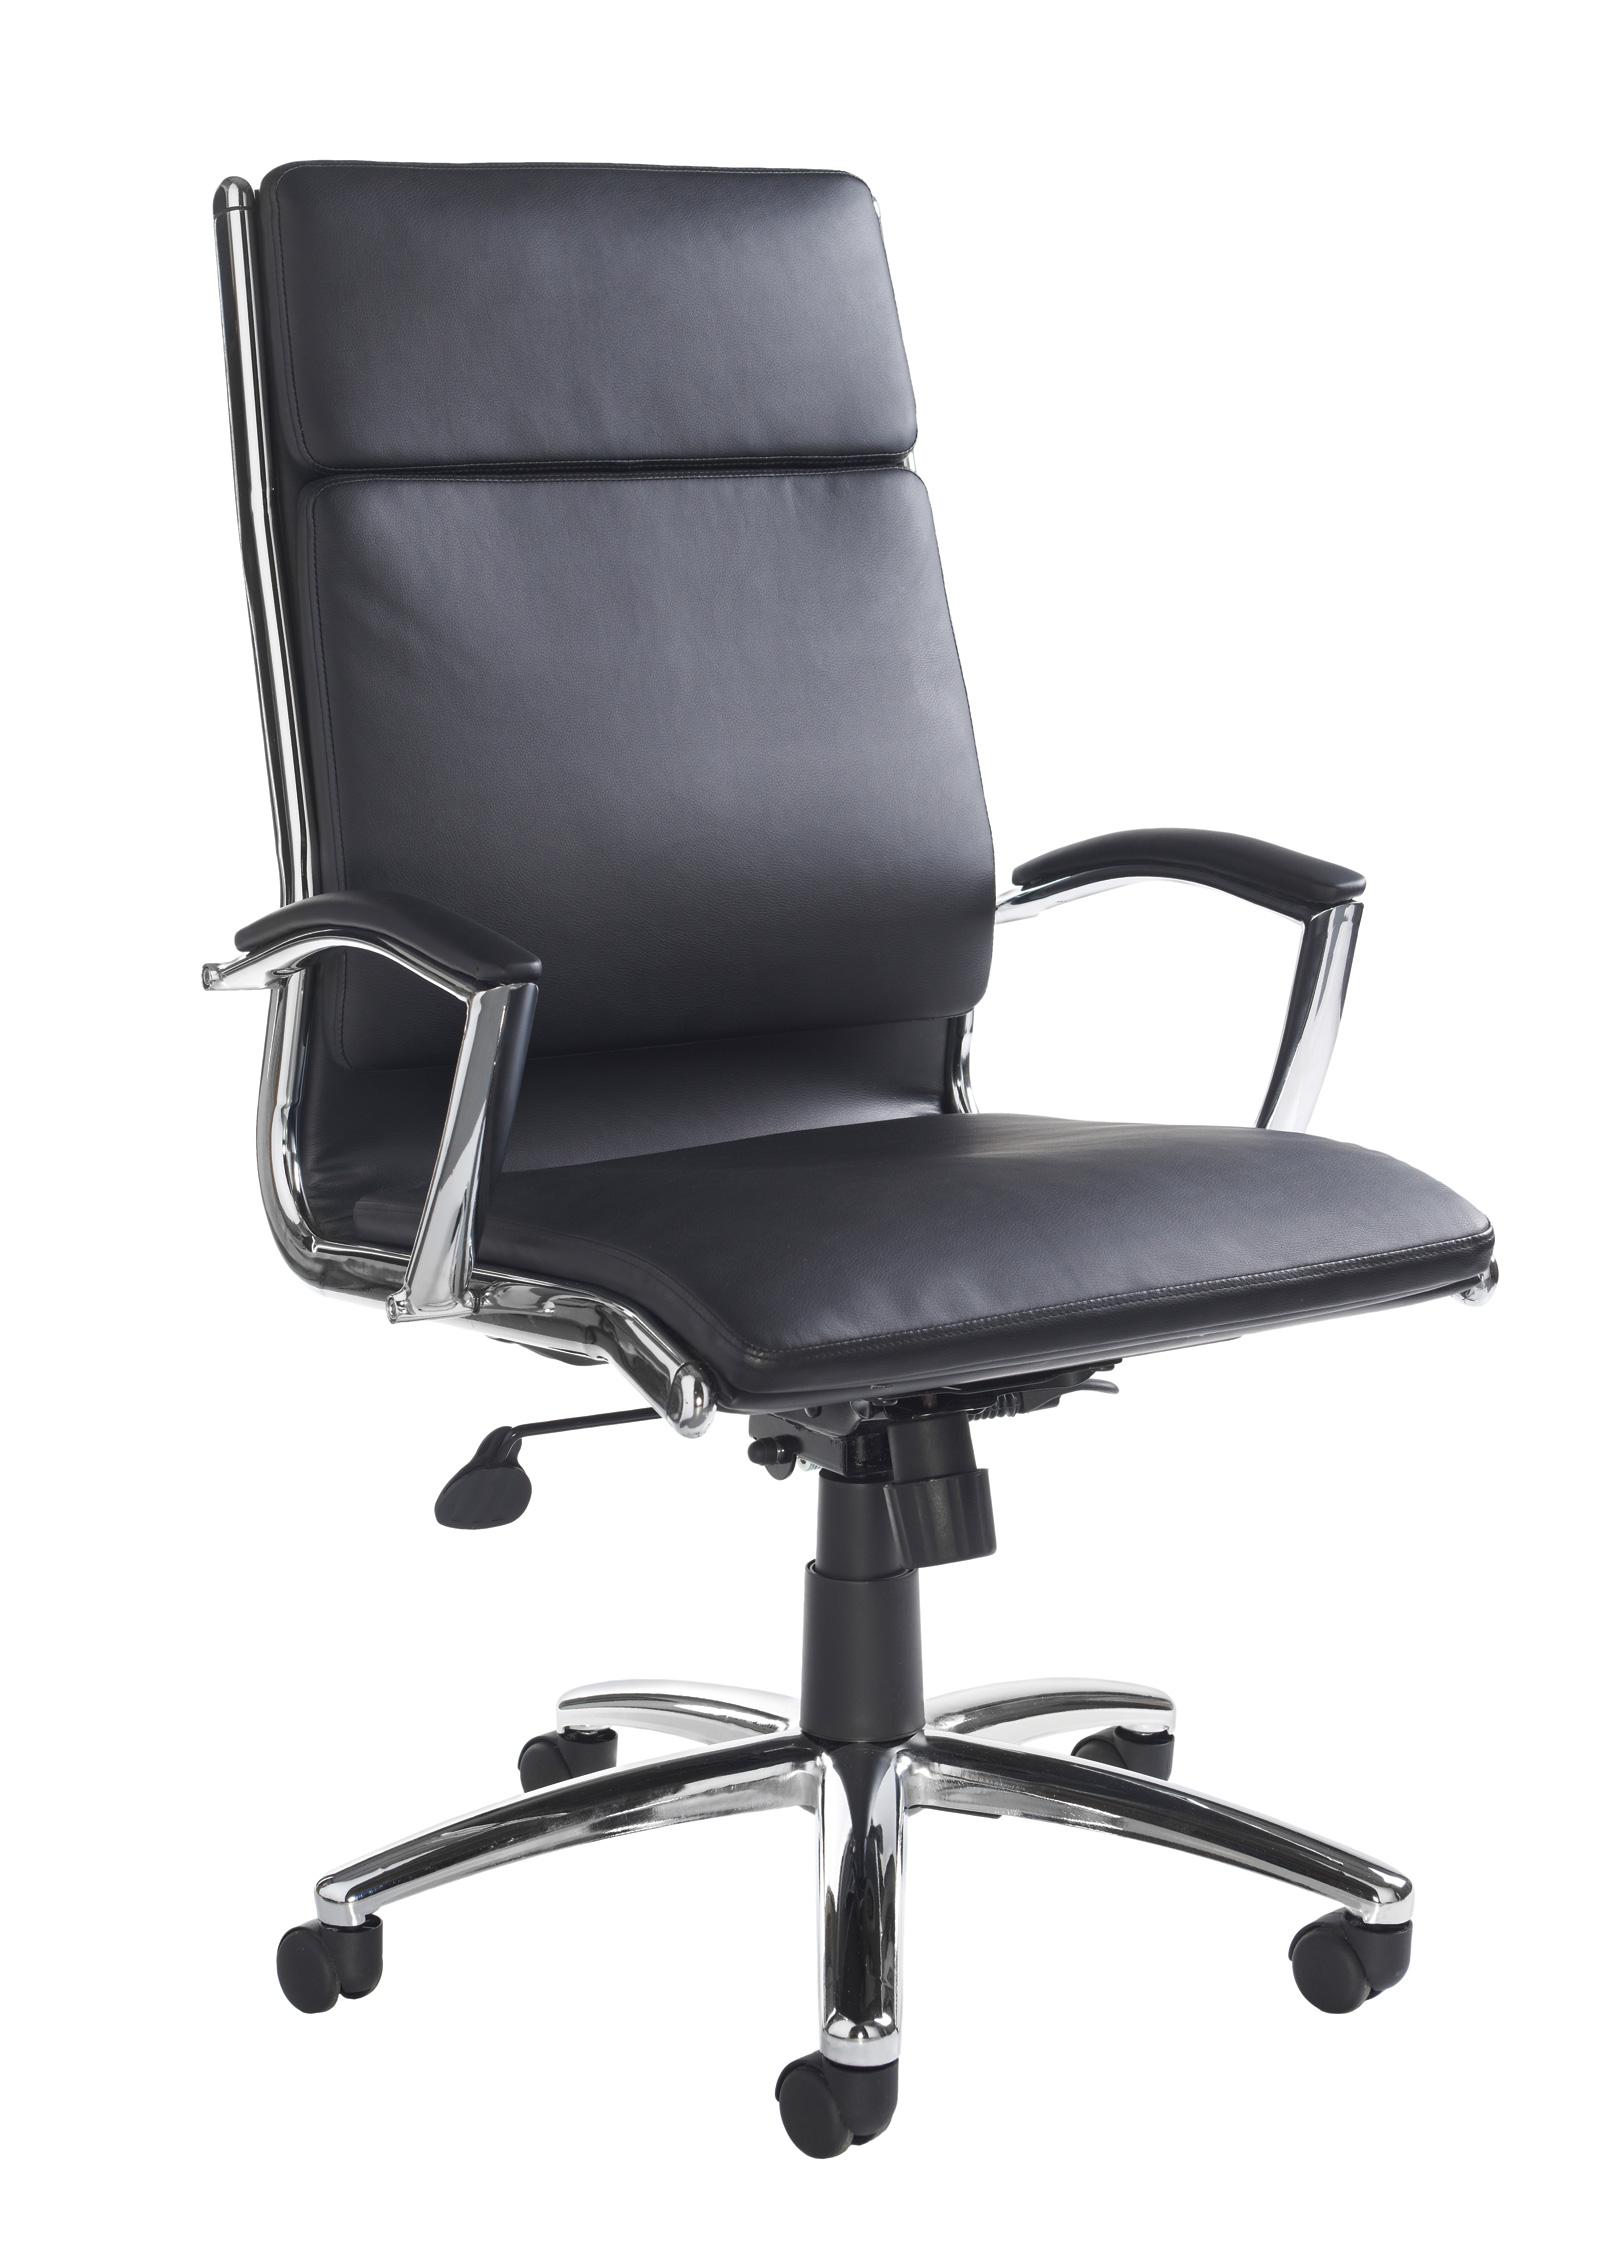 Florence high back executive chair